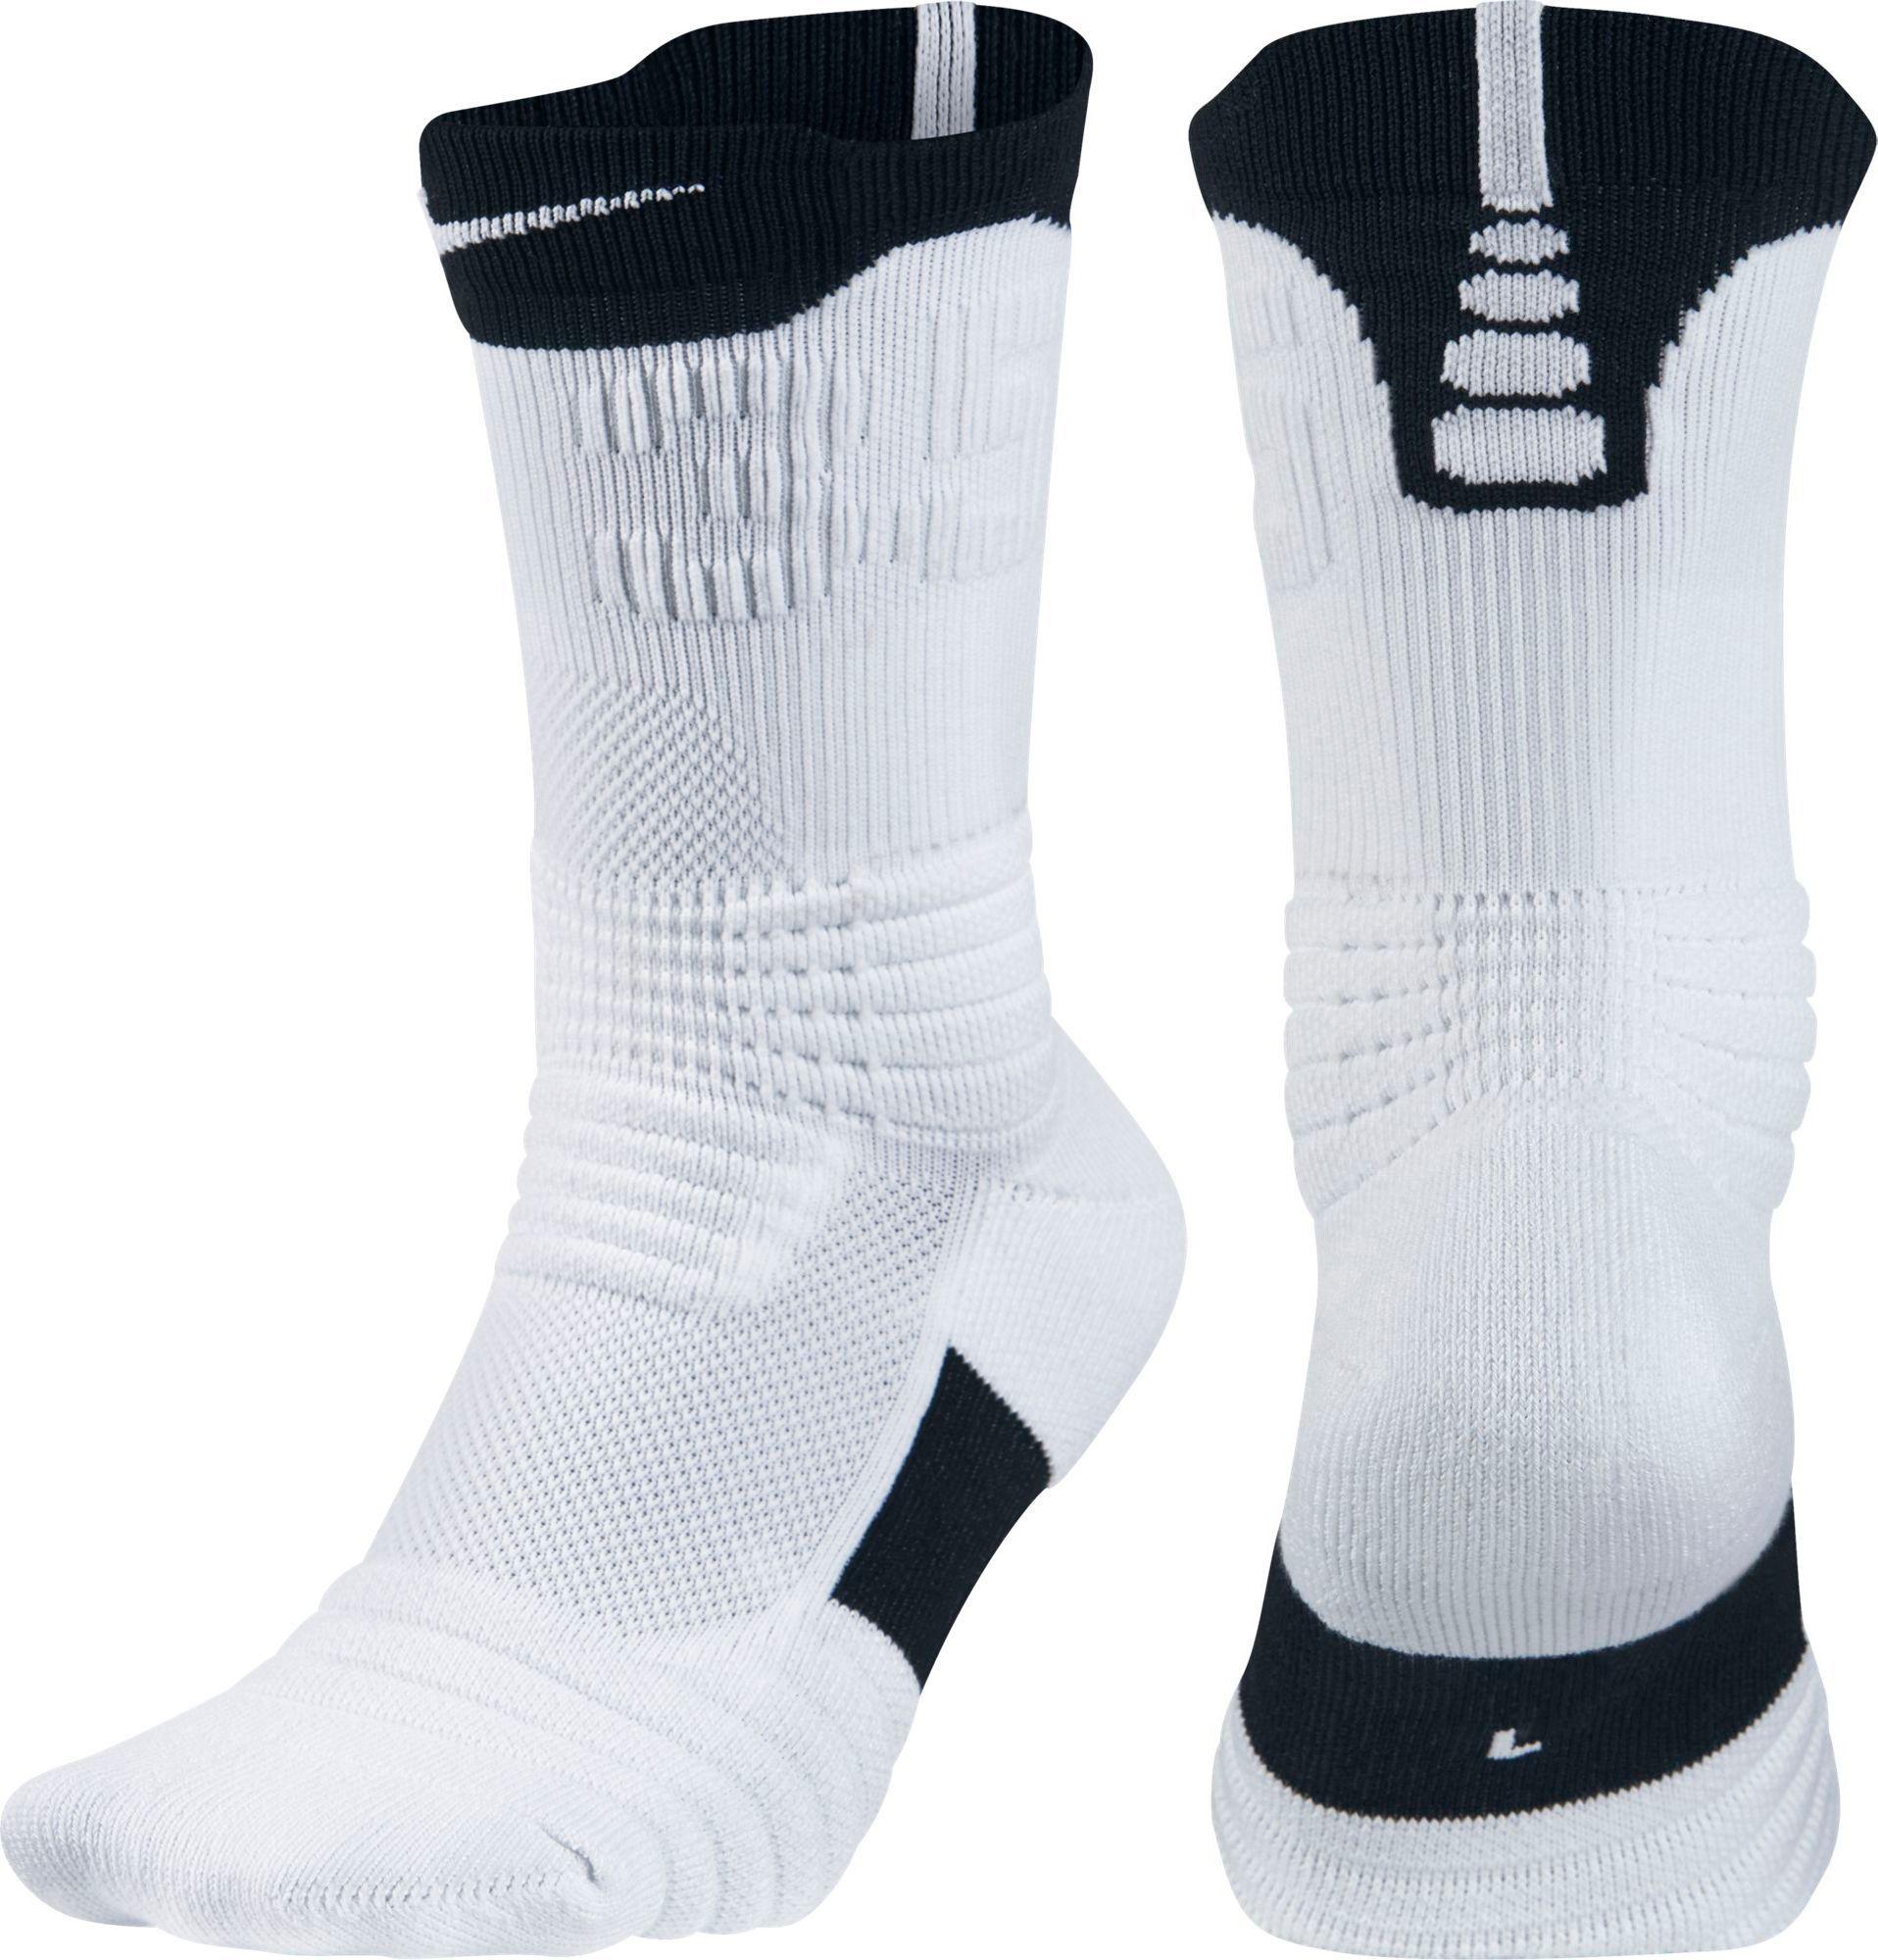 Bump Set Spike Custom Nike Elite Volleyball Socks Volleyball Socks Nike Elite Socks Custom Nike Elites